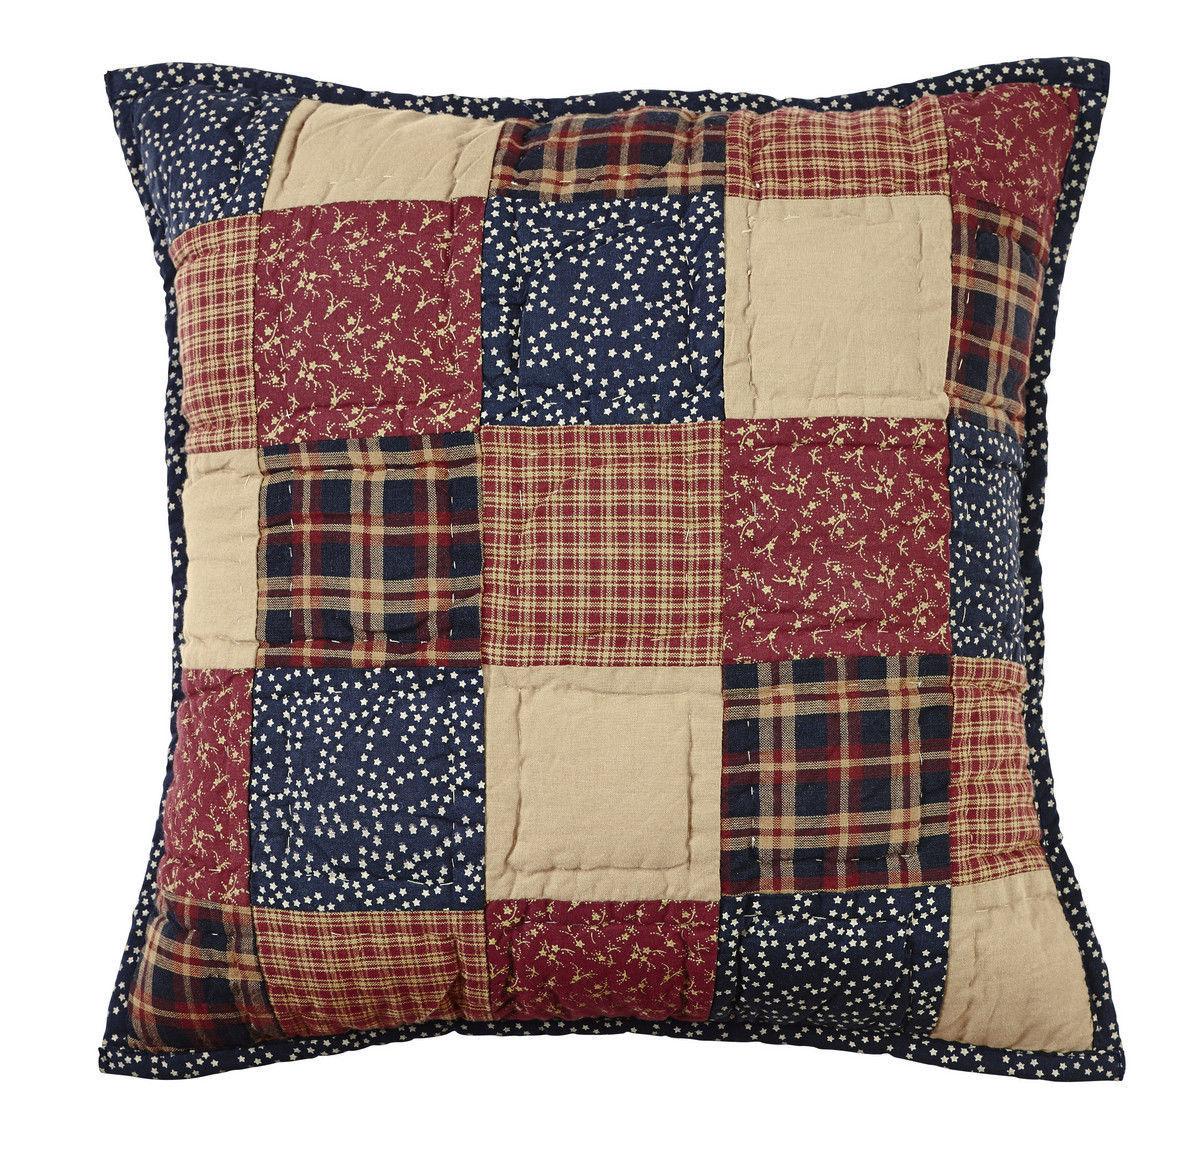 "Olivia's Heartland patriotic Americana handmade Old Glory Pillow Cover 16""x16"" - $24.95"